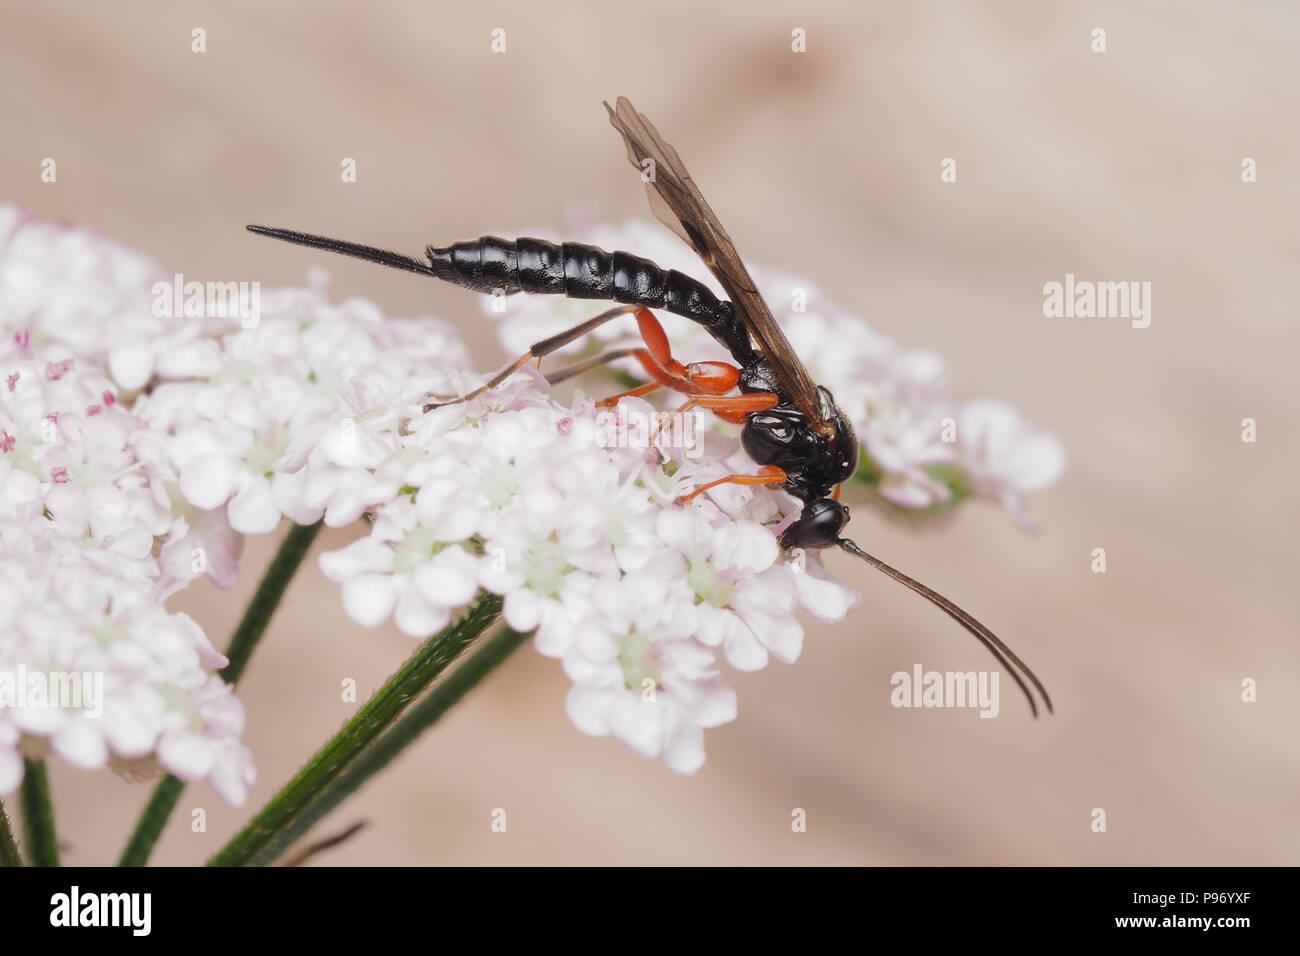 Ichneumonid Wasp feeding on umbellifer flower. Tipperary, Ireland - Stock Image